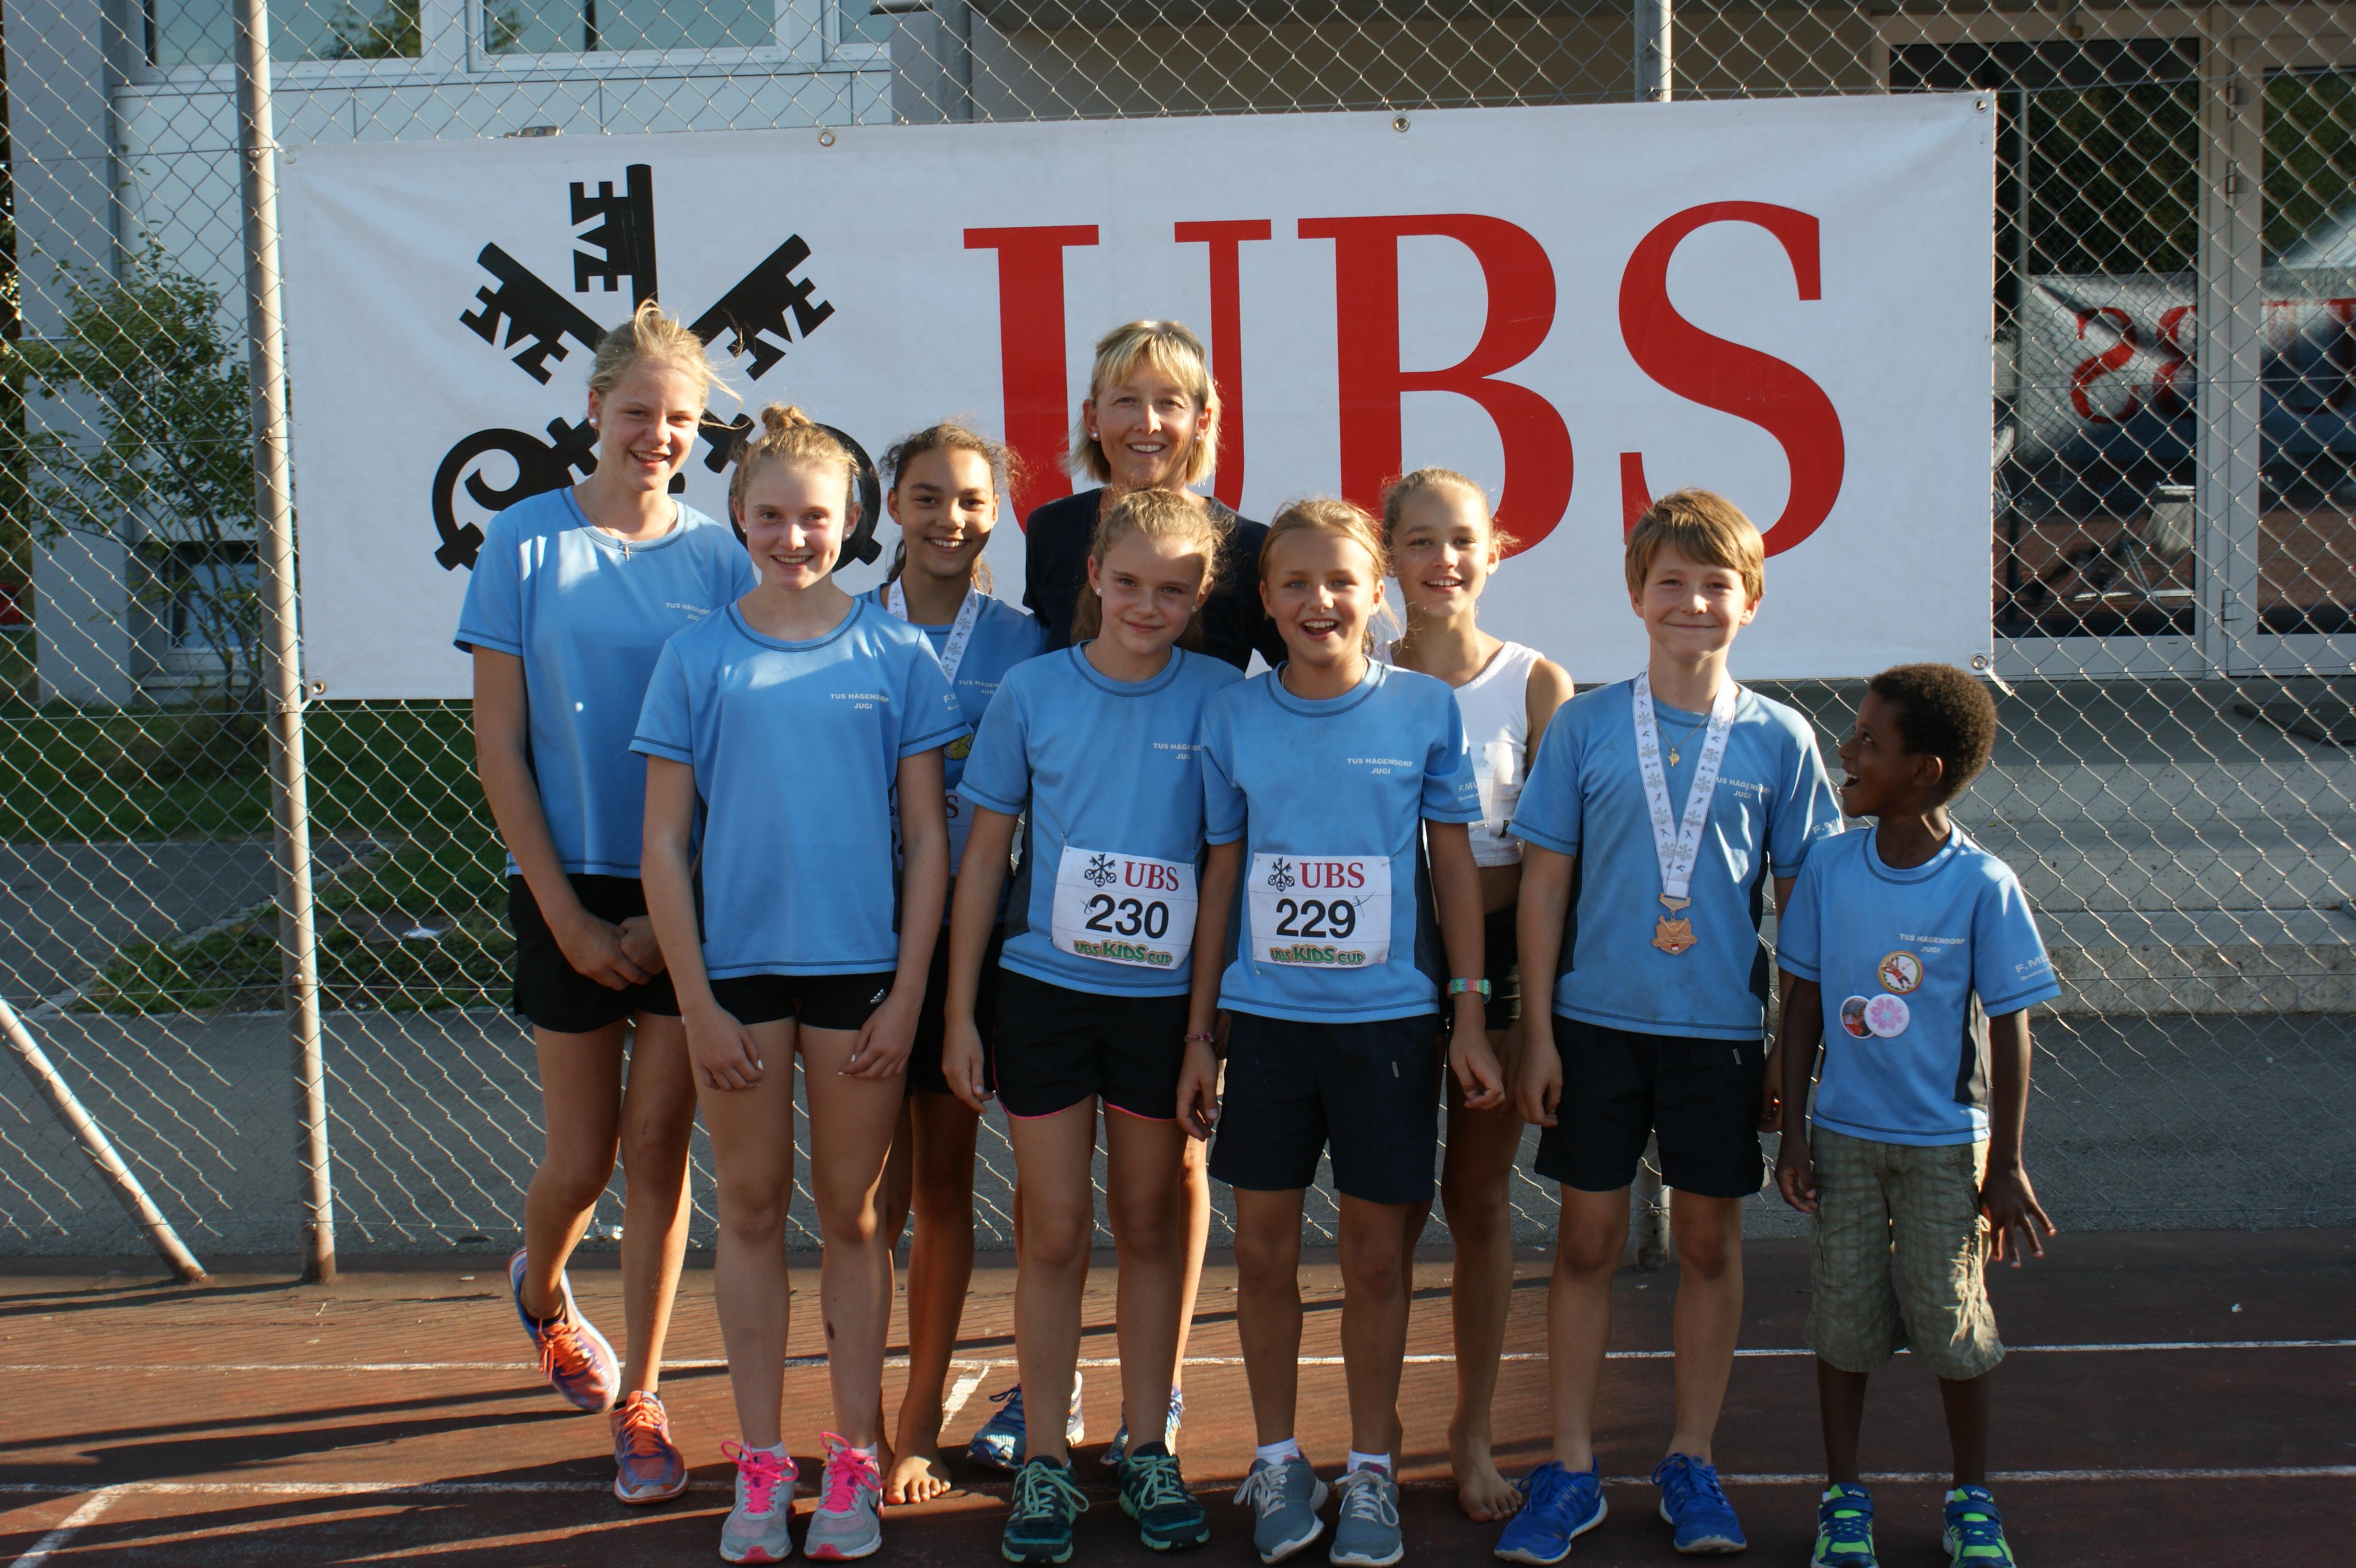 UBS Kids Cup Kantonalfinal Biberist 2015